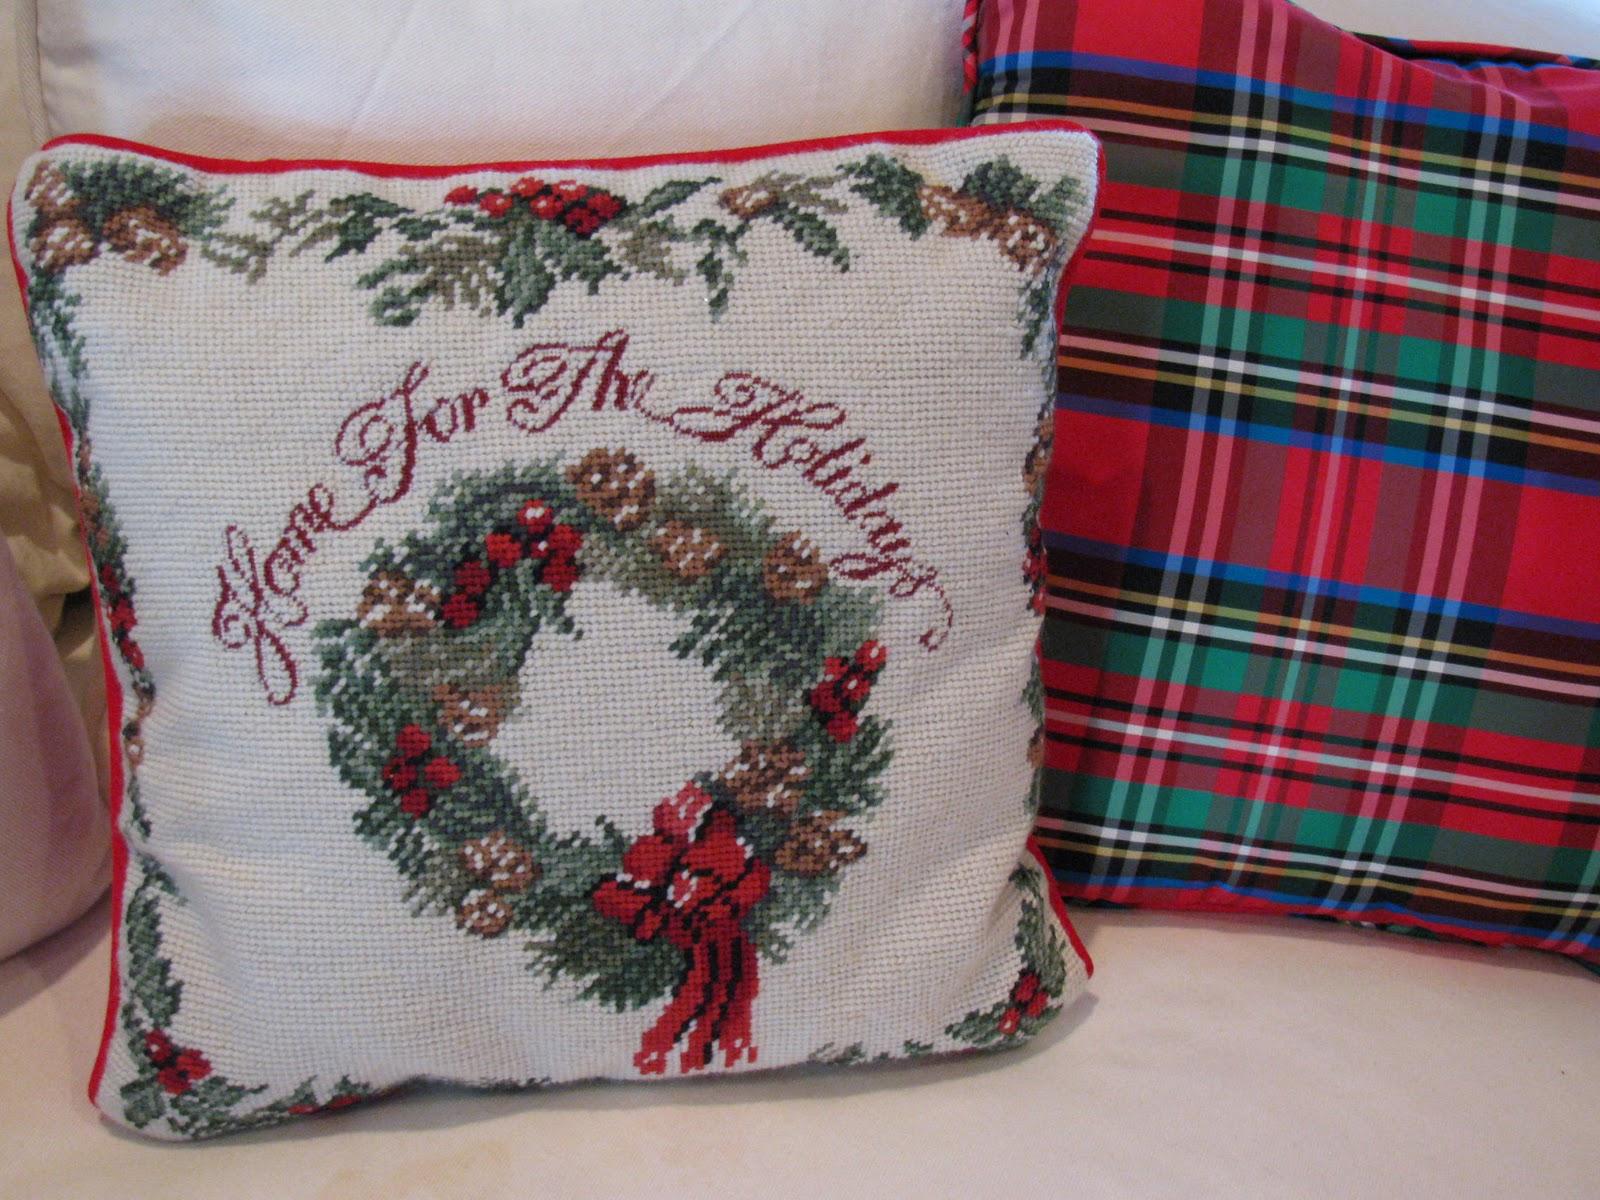 MAY DAYS: Needlepoint Christmas Pillows